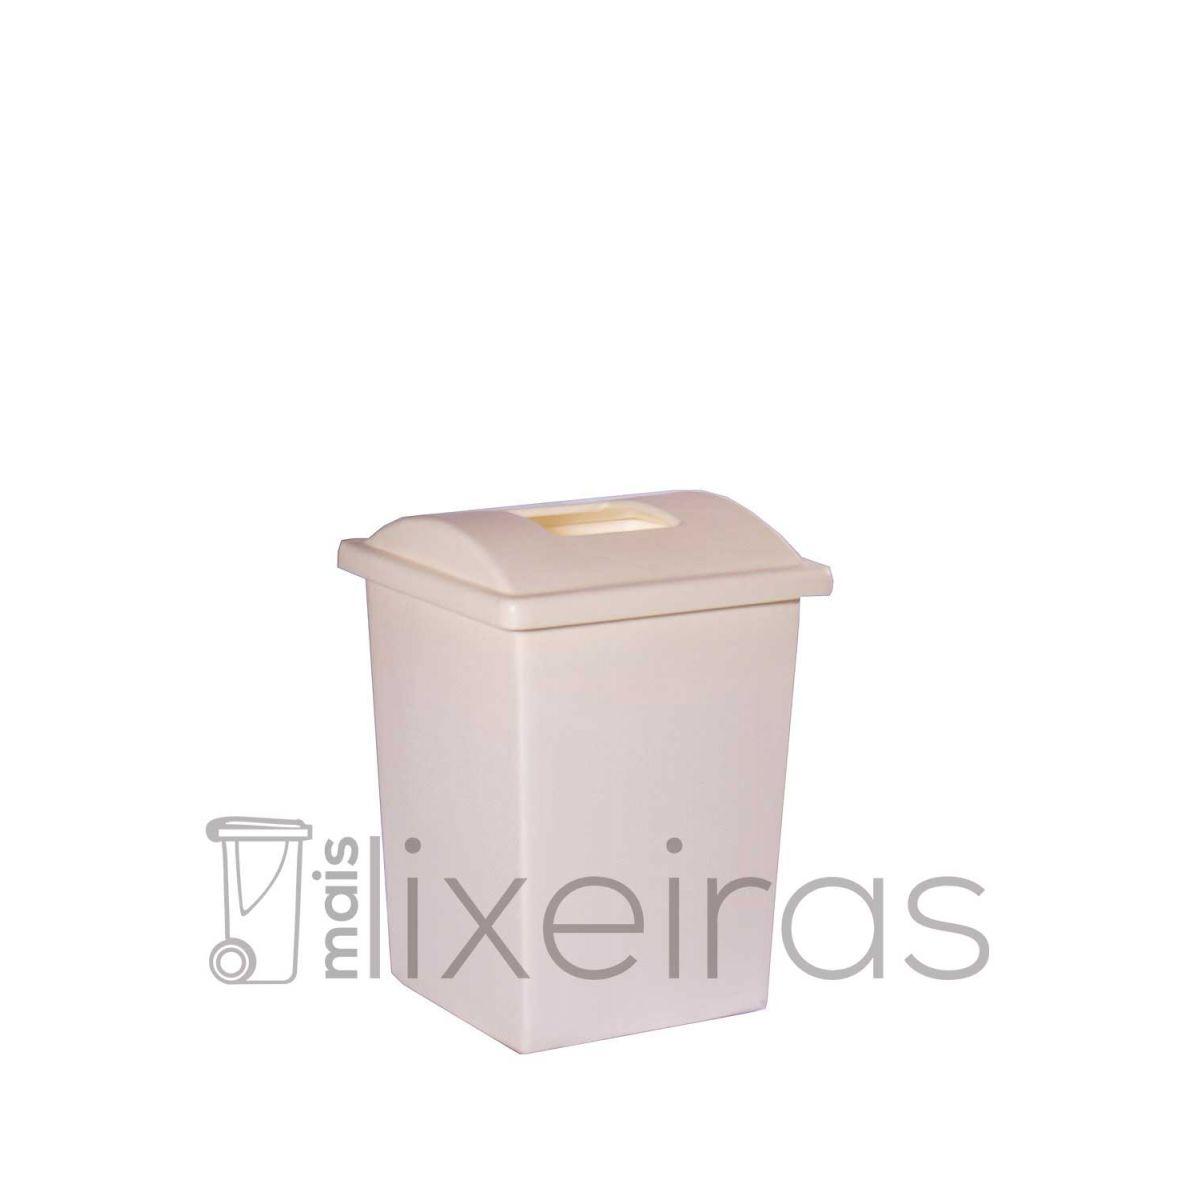 Lixeira colorida com tampa personalizada - 60 litros